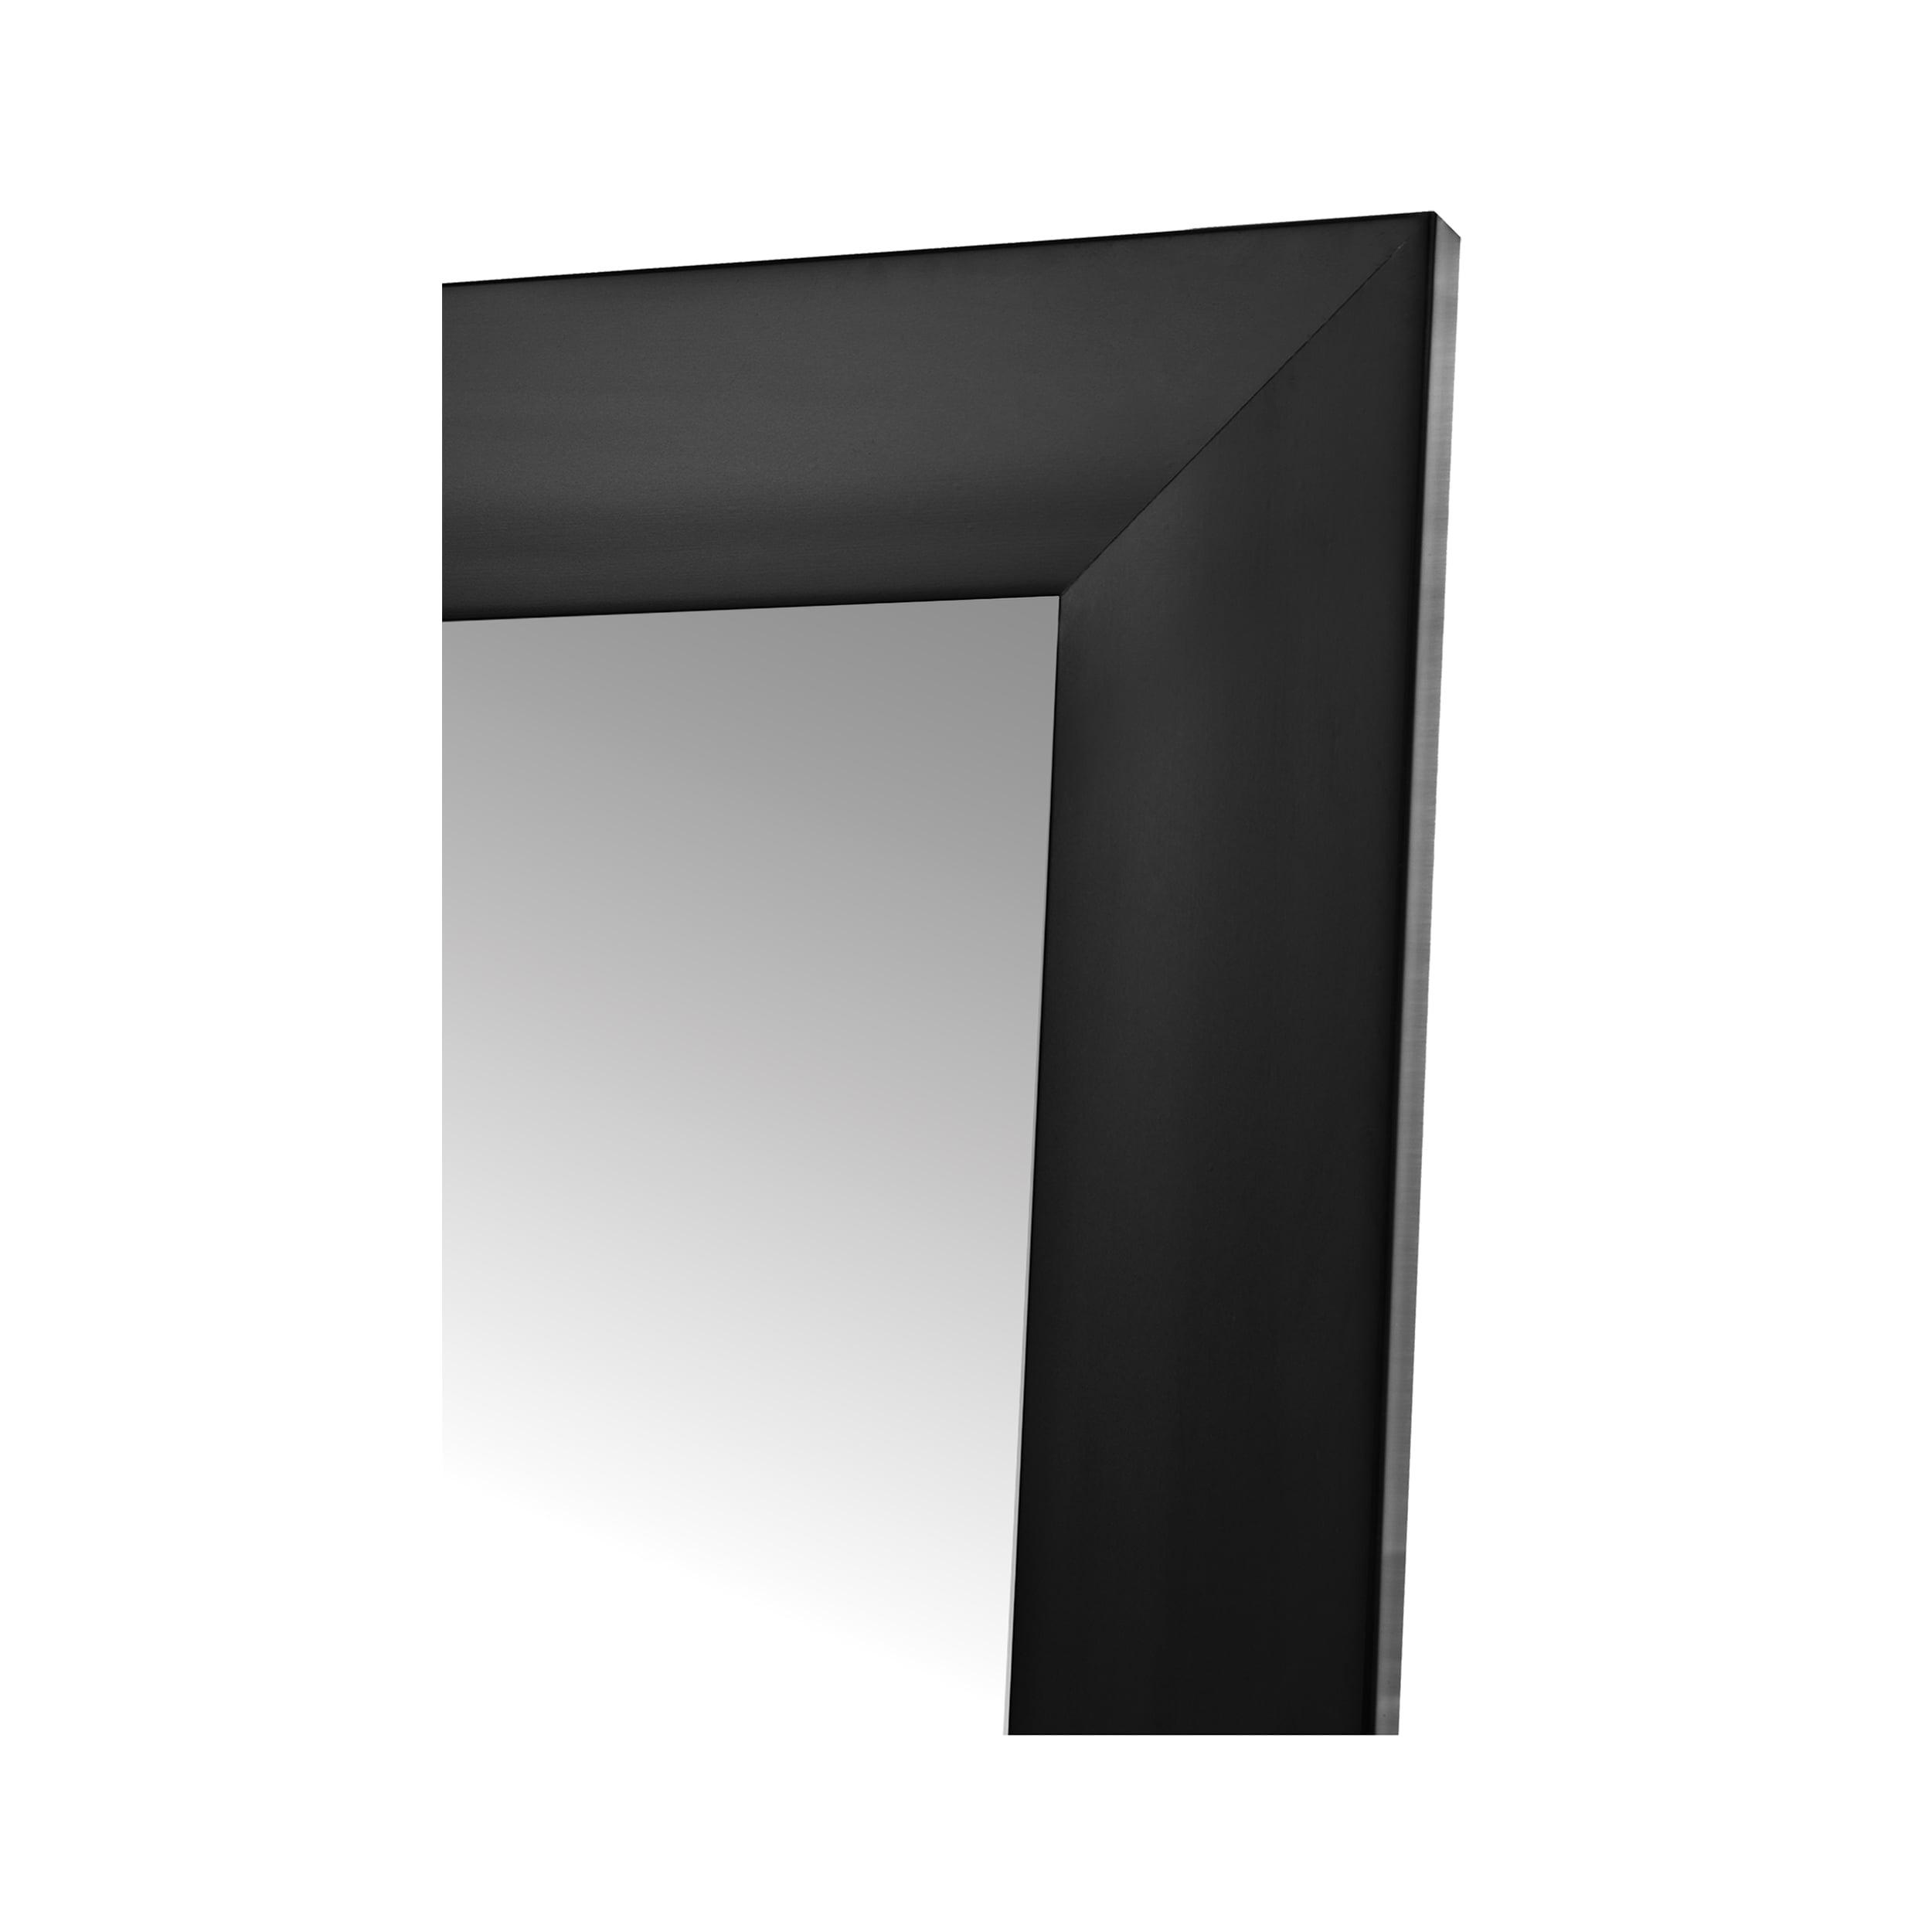 Fornari Black Non-Beveled Casegood